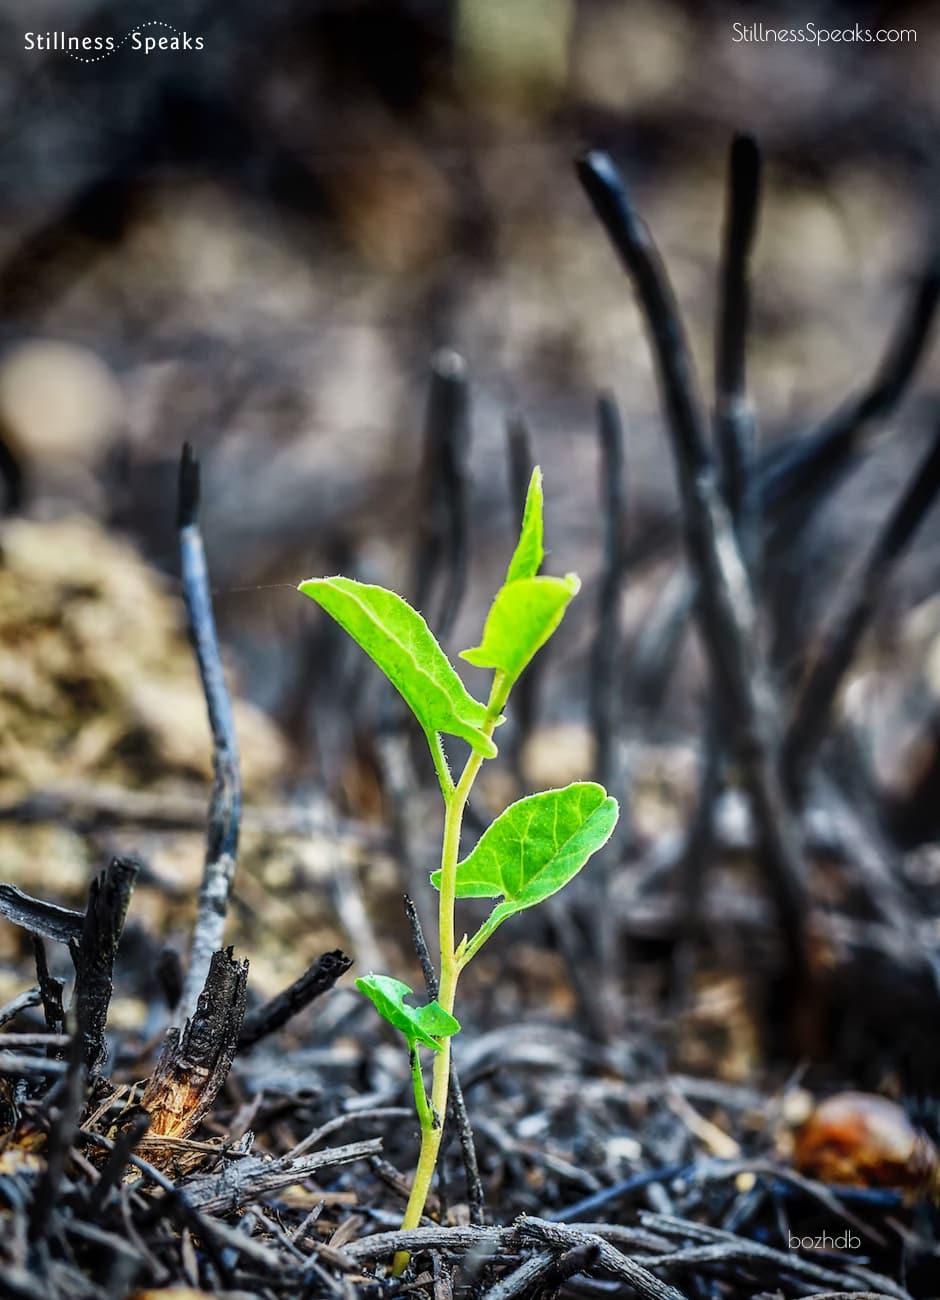 merton plants seed